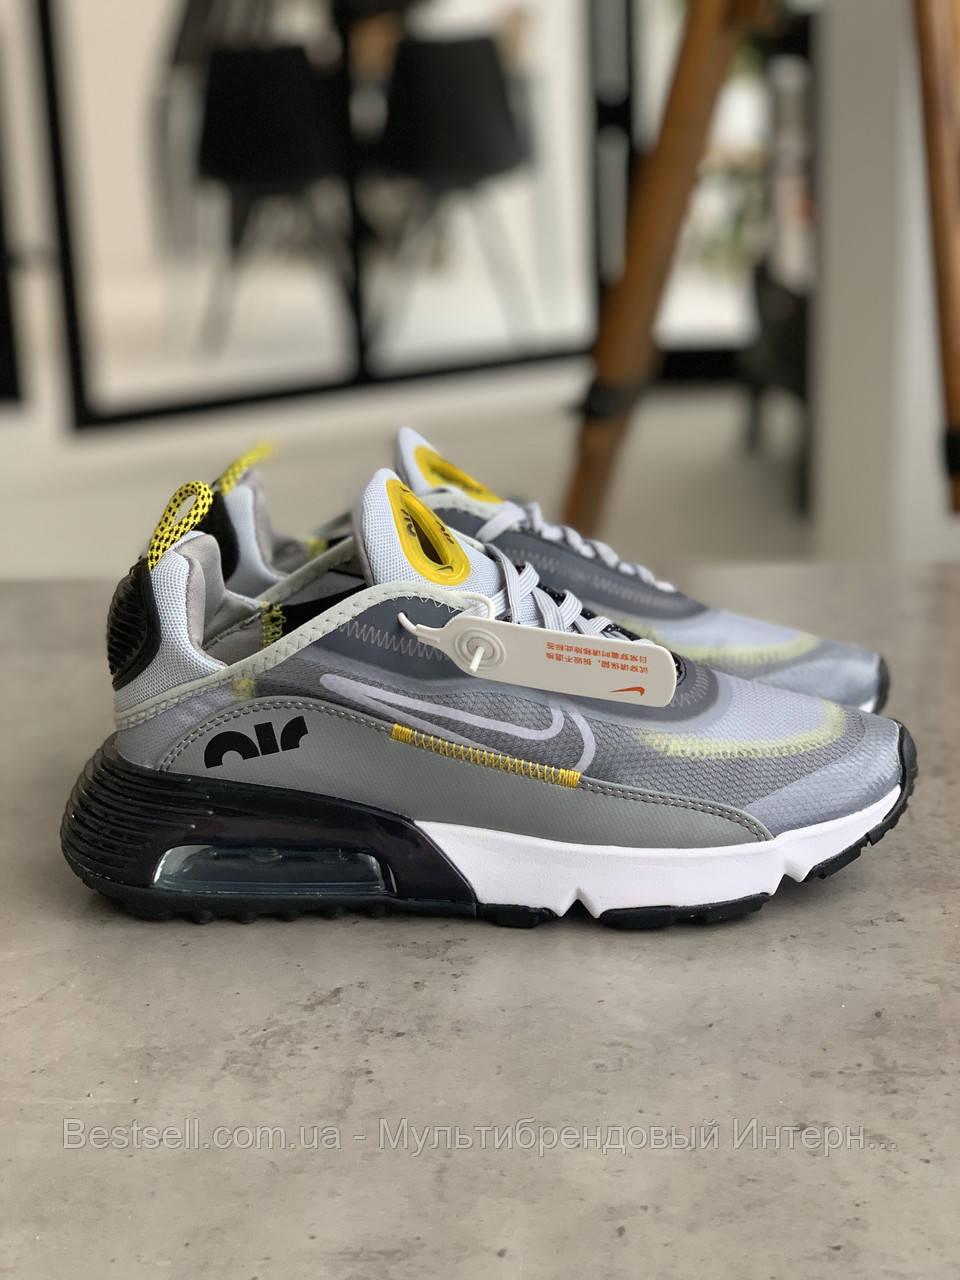 Кросівки Nike Air Max 2090 Найк Аір Макс 2090 (41,42,43,44,45)